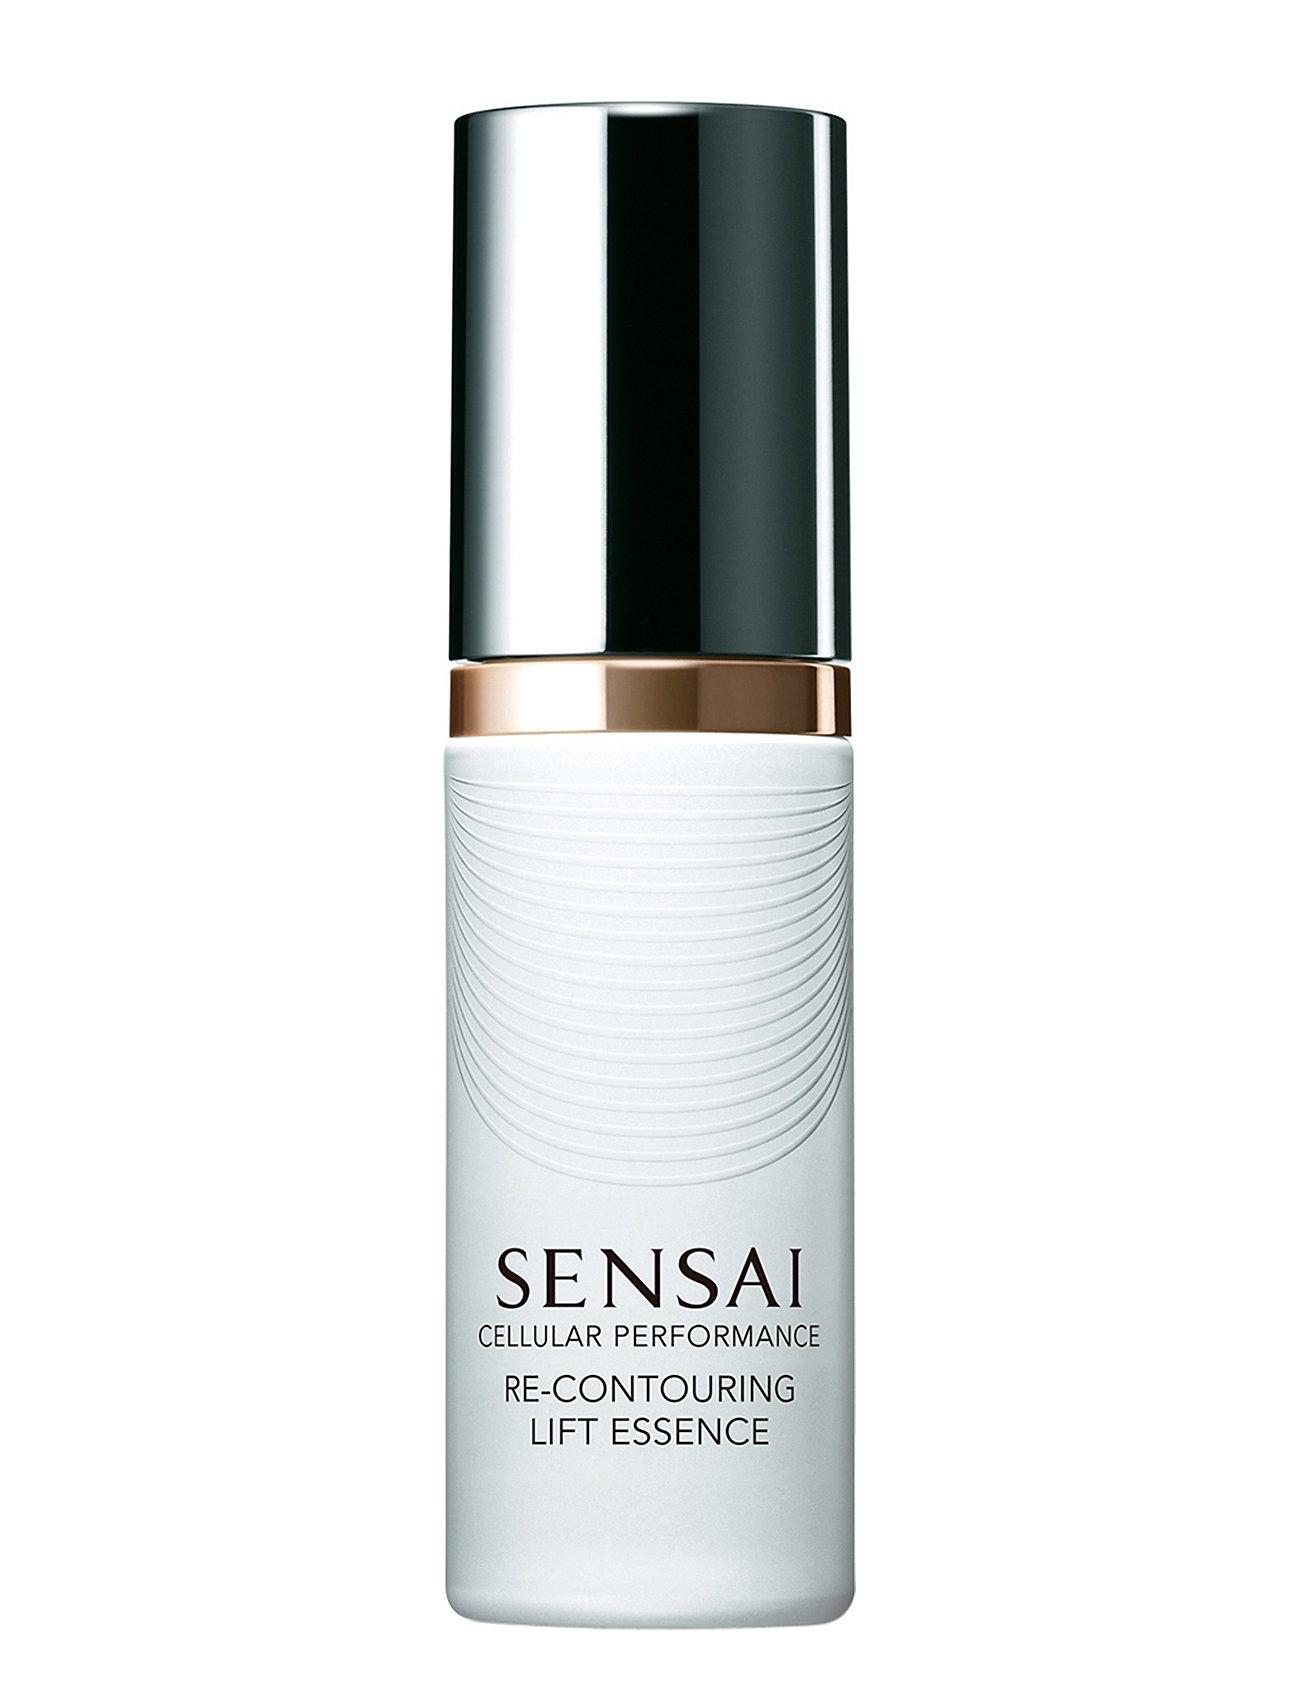 SENSAI Cellular Performance Re-Contouring Lift Essence - NO COLOR